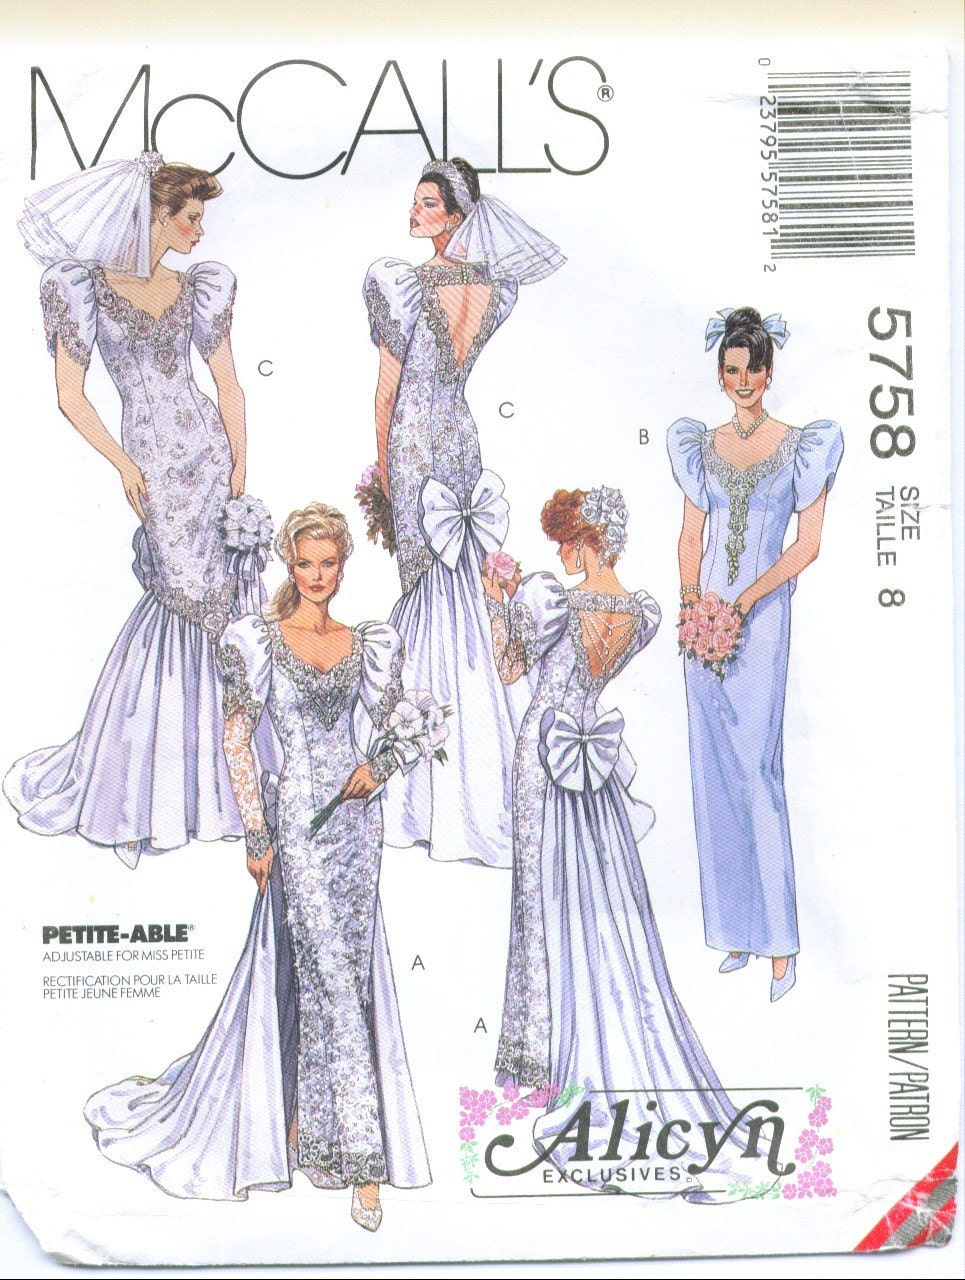 Mccall 39 s 5758 alicyn wedding dress sewing pattern size 8 for Sewing patterns wedding dress